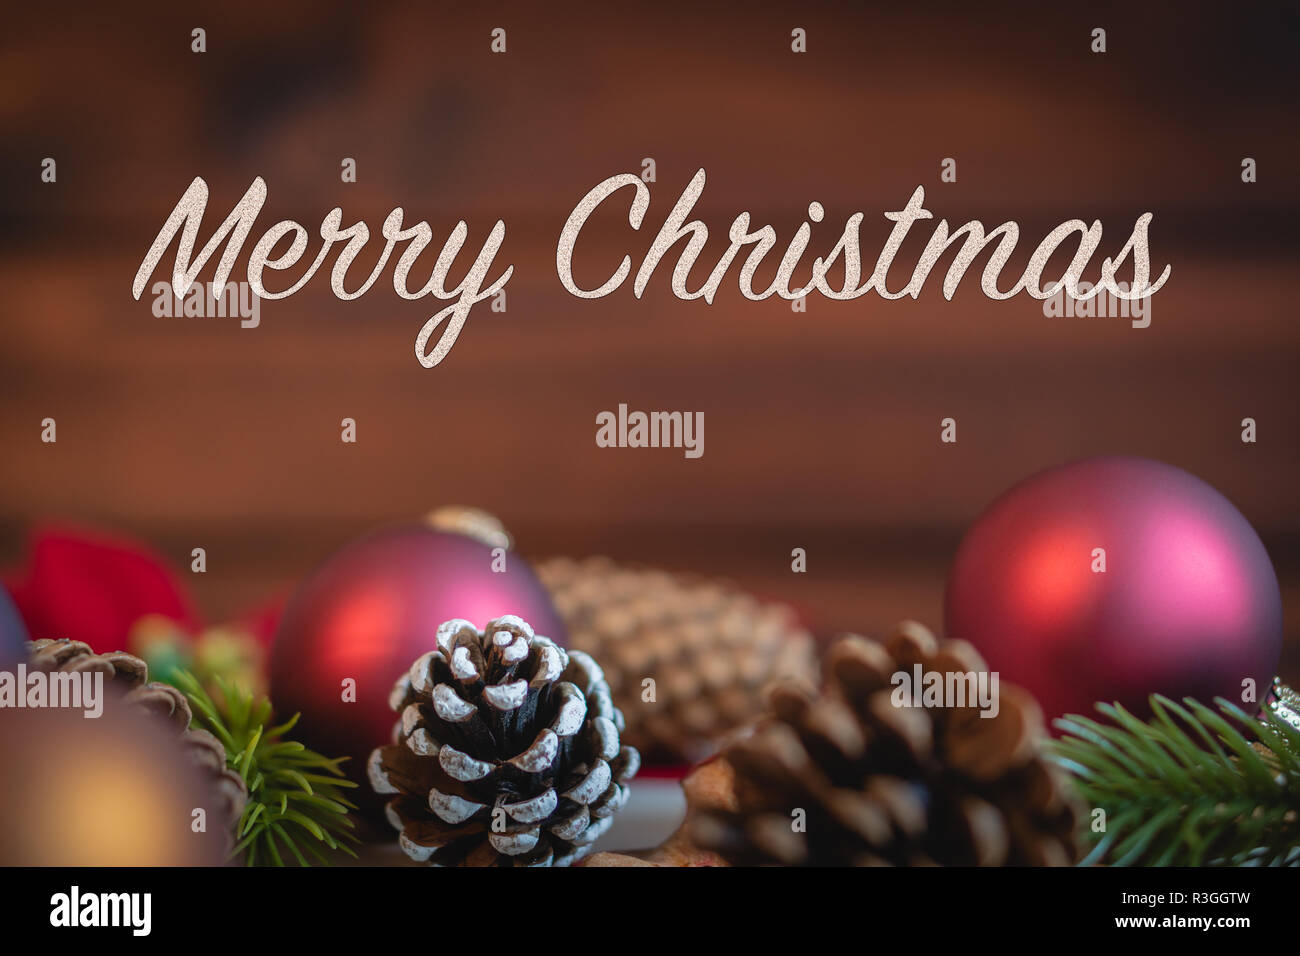 Merry Christmas Message Stockfotos & Merry Christmas Message Bilder ...